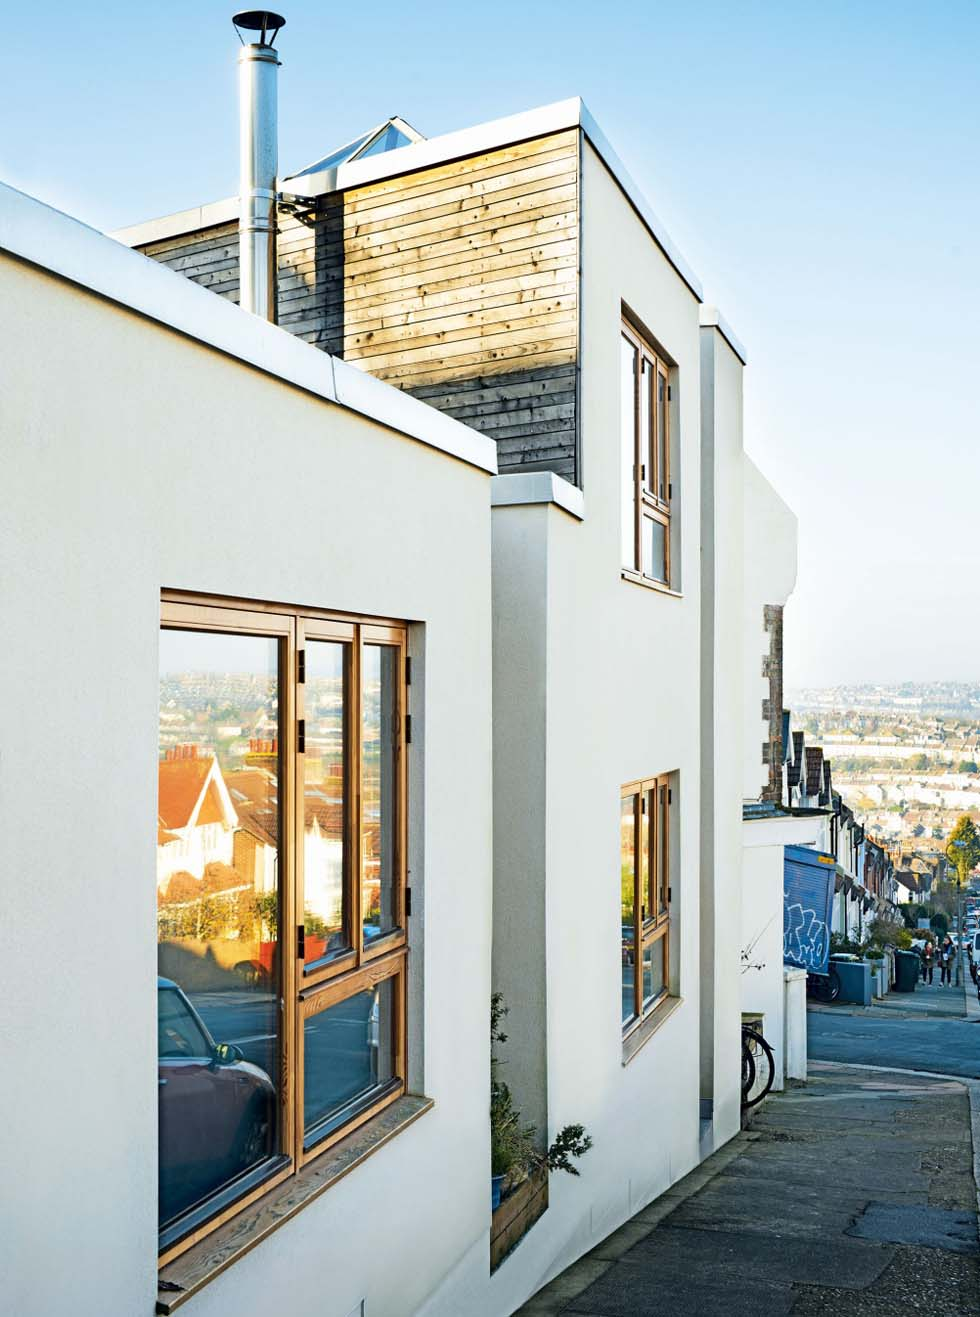 Brighton self build under £90k